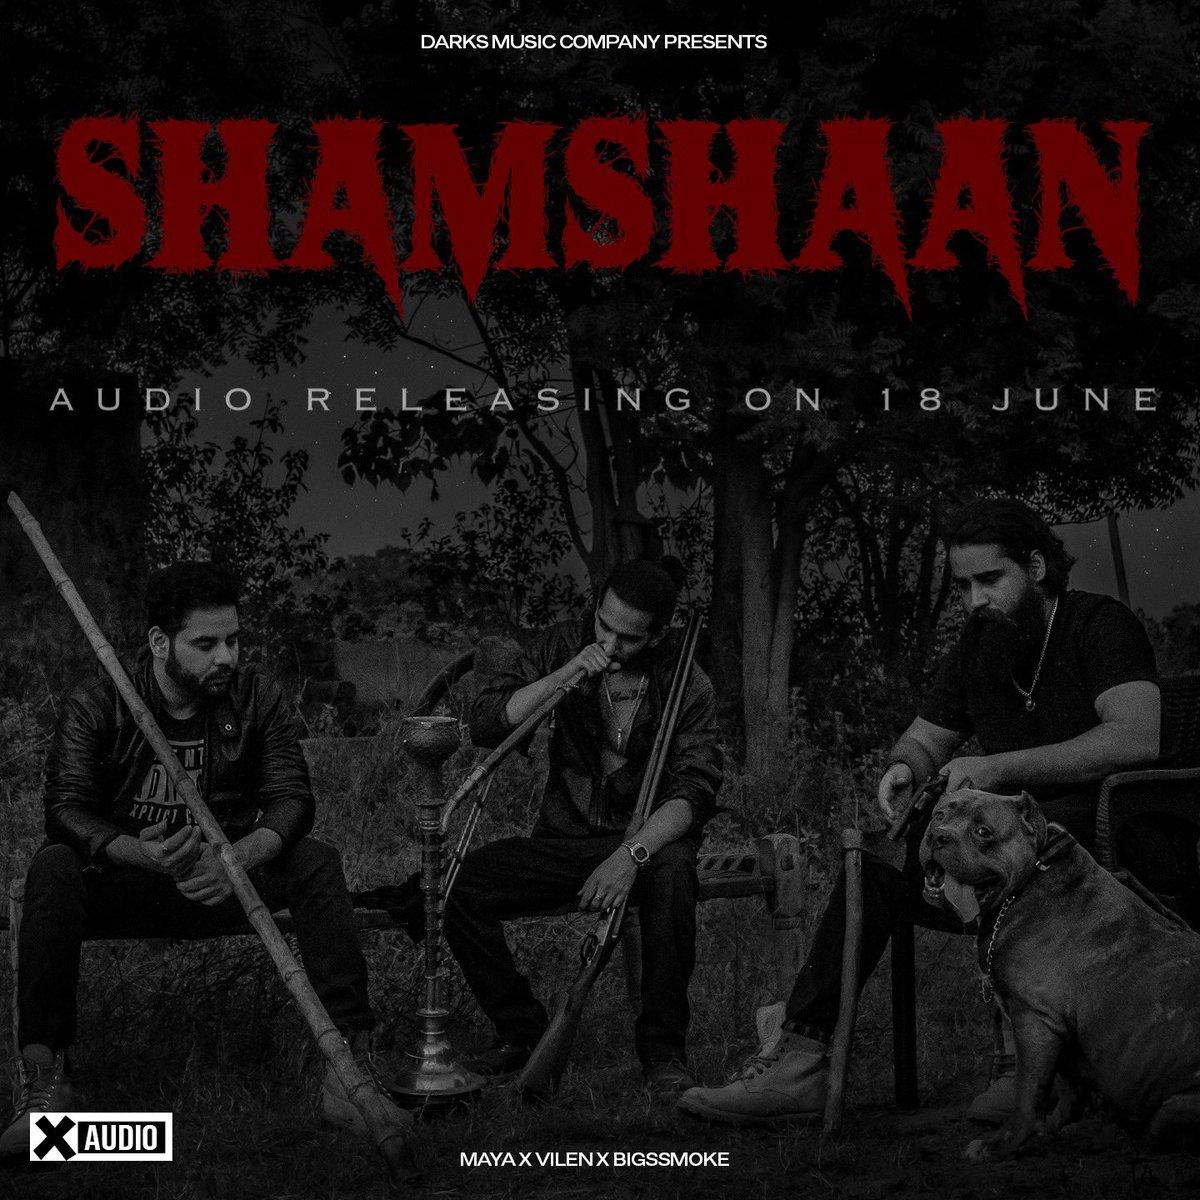 Shamshaan- Maya x Vilen x bigSsmoke Audio Releasing on 18 June  #excited? pic.twitter.com/WyL4lDeyJT